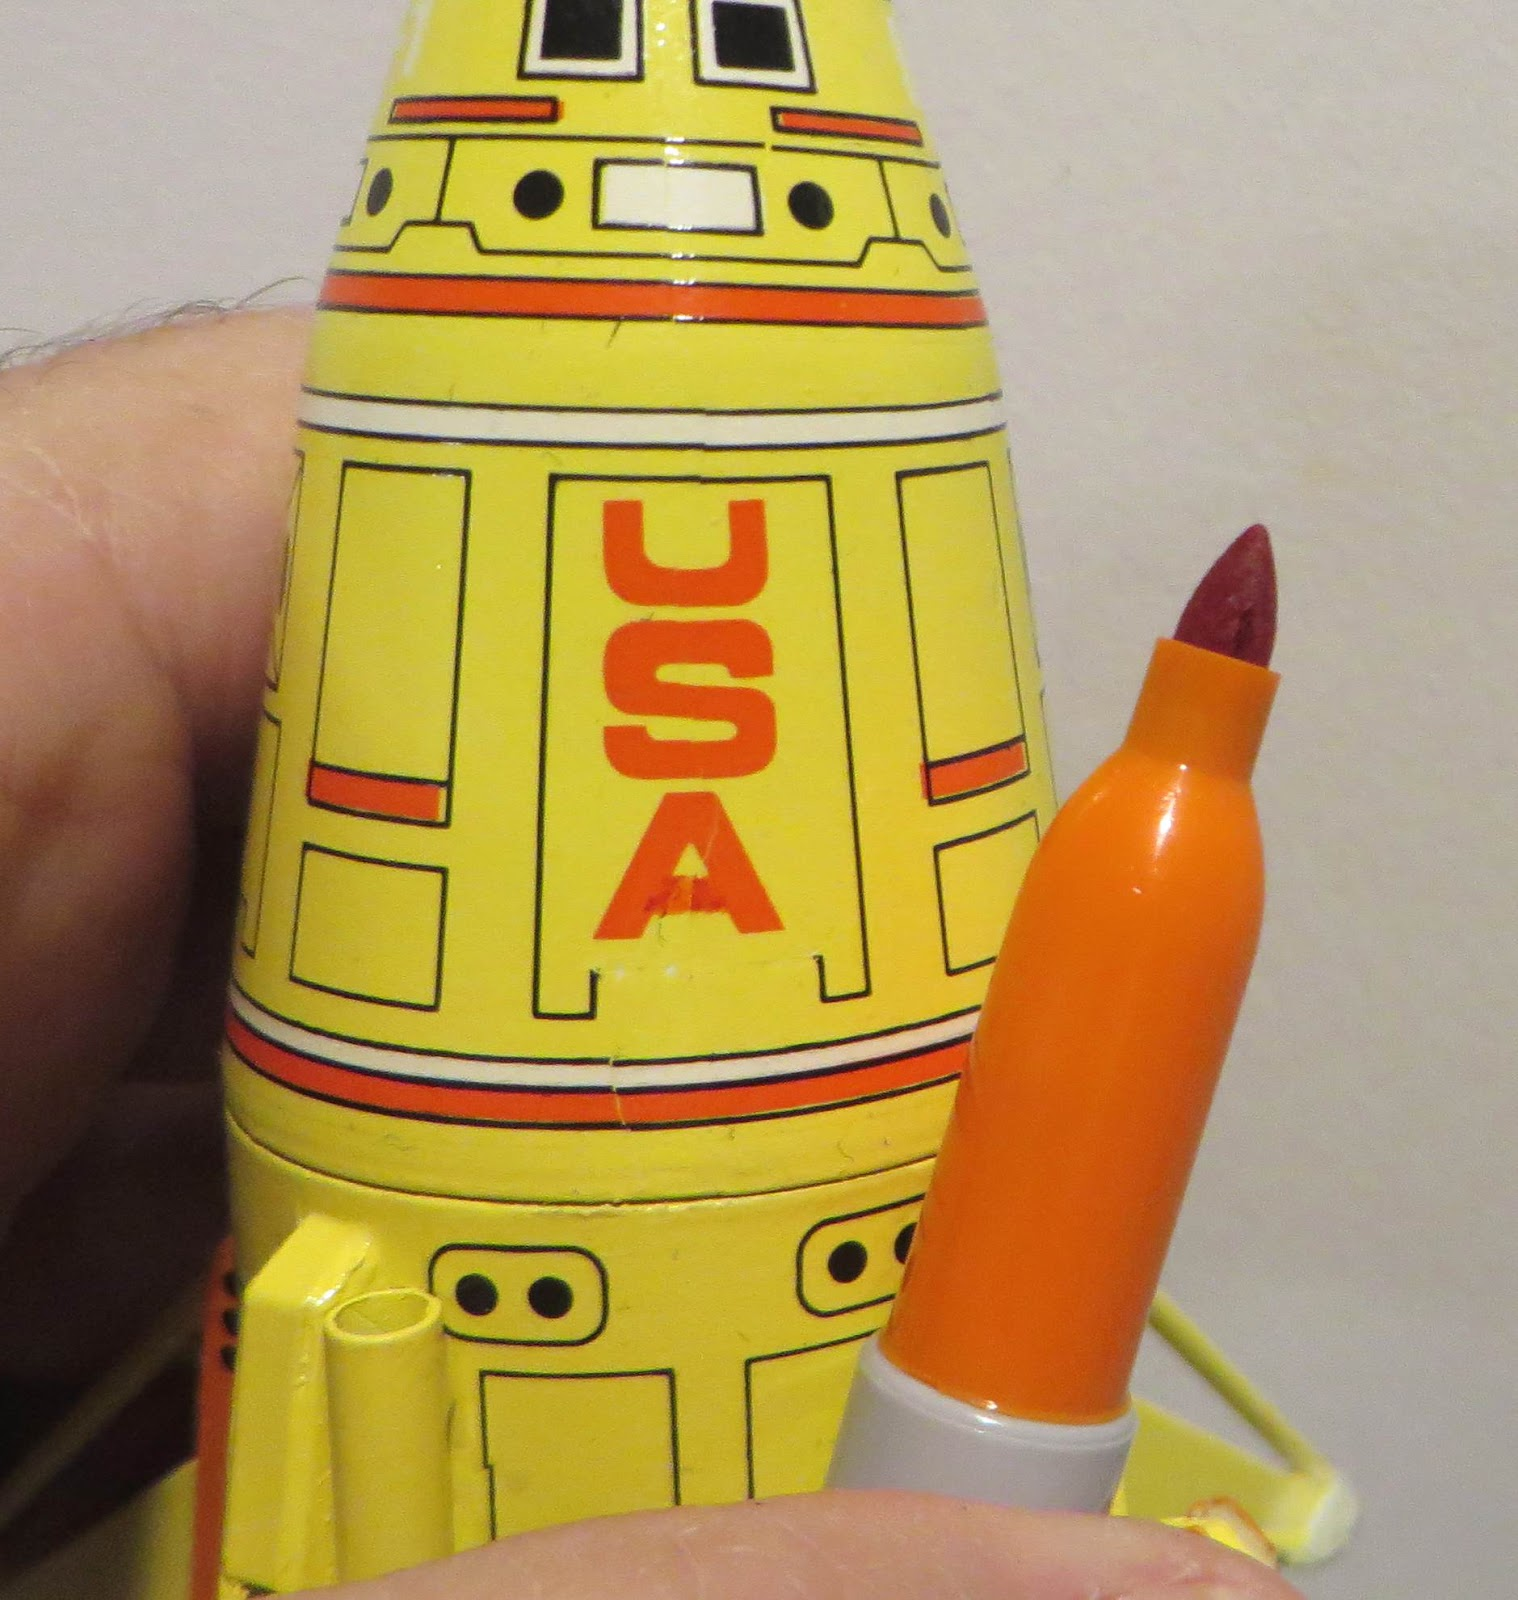 Model Rocket Building: Estes Mini Mars Lander Build #0881